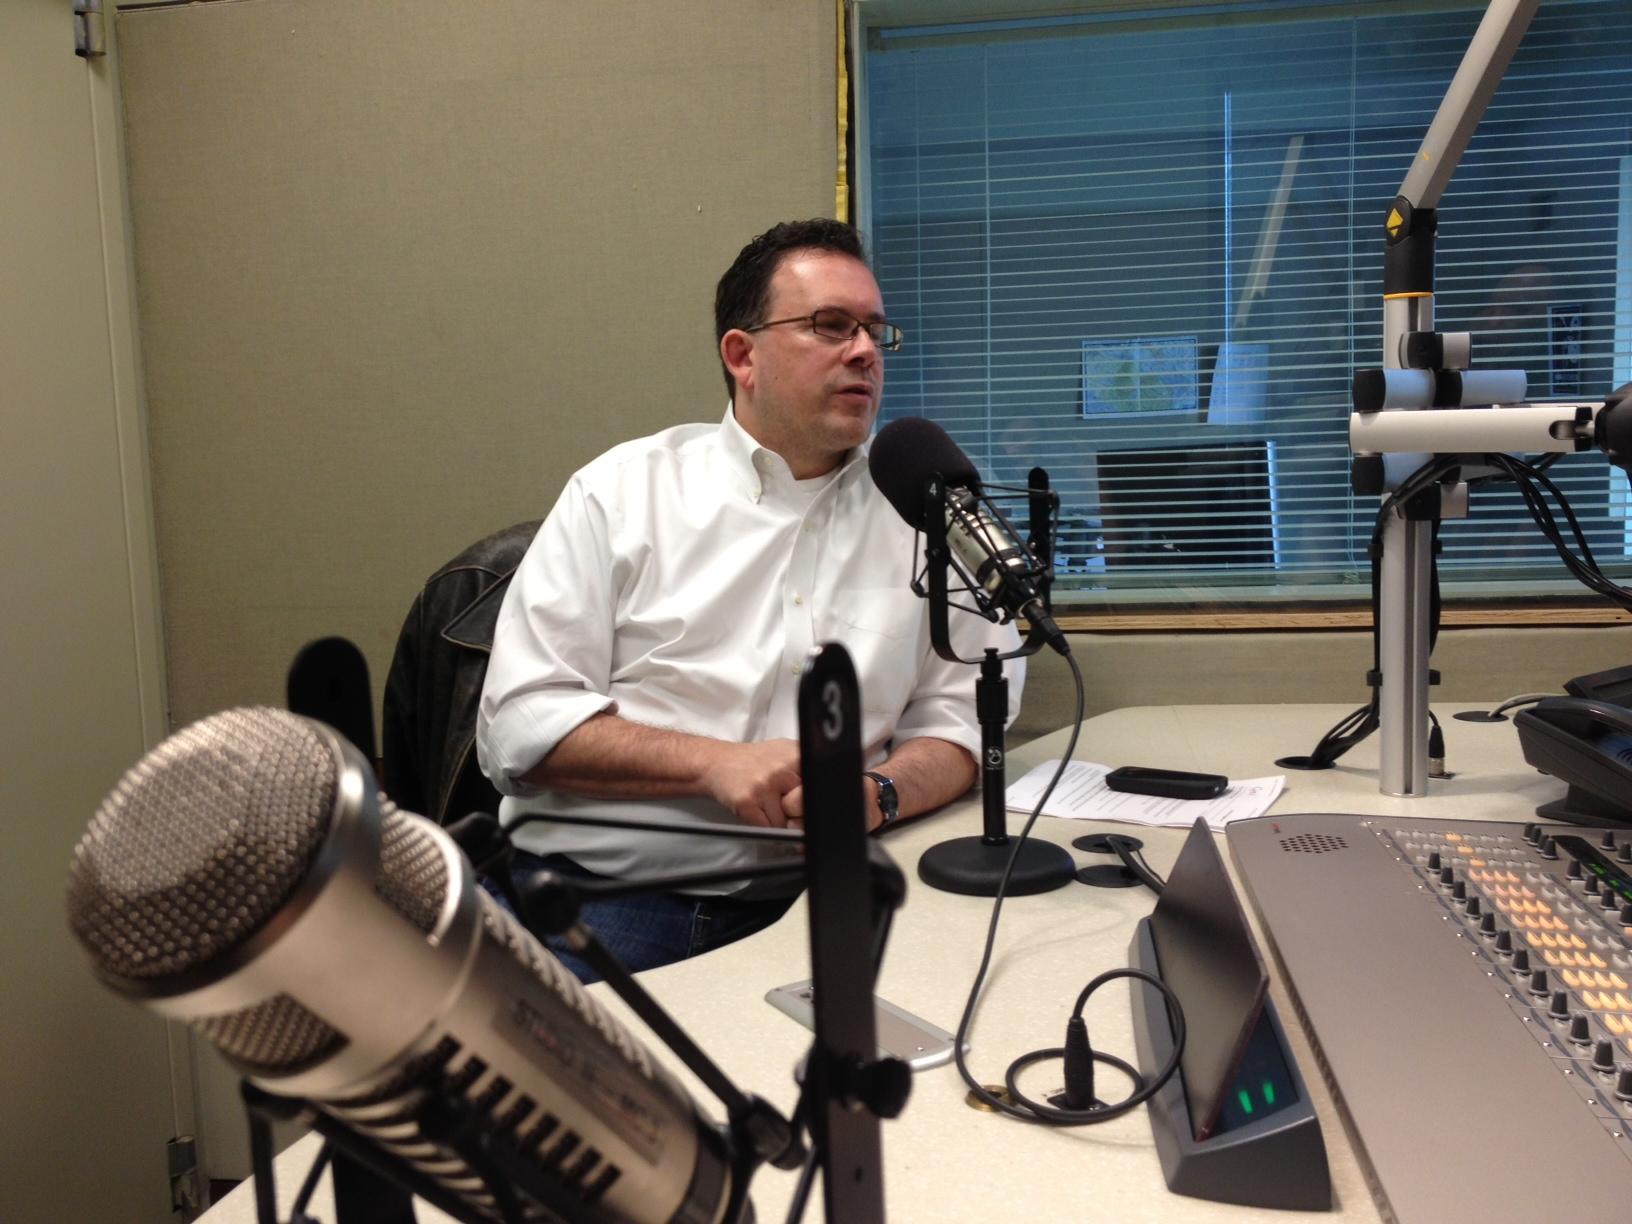 Jim Brady of Digital First Media